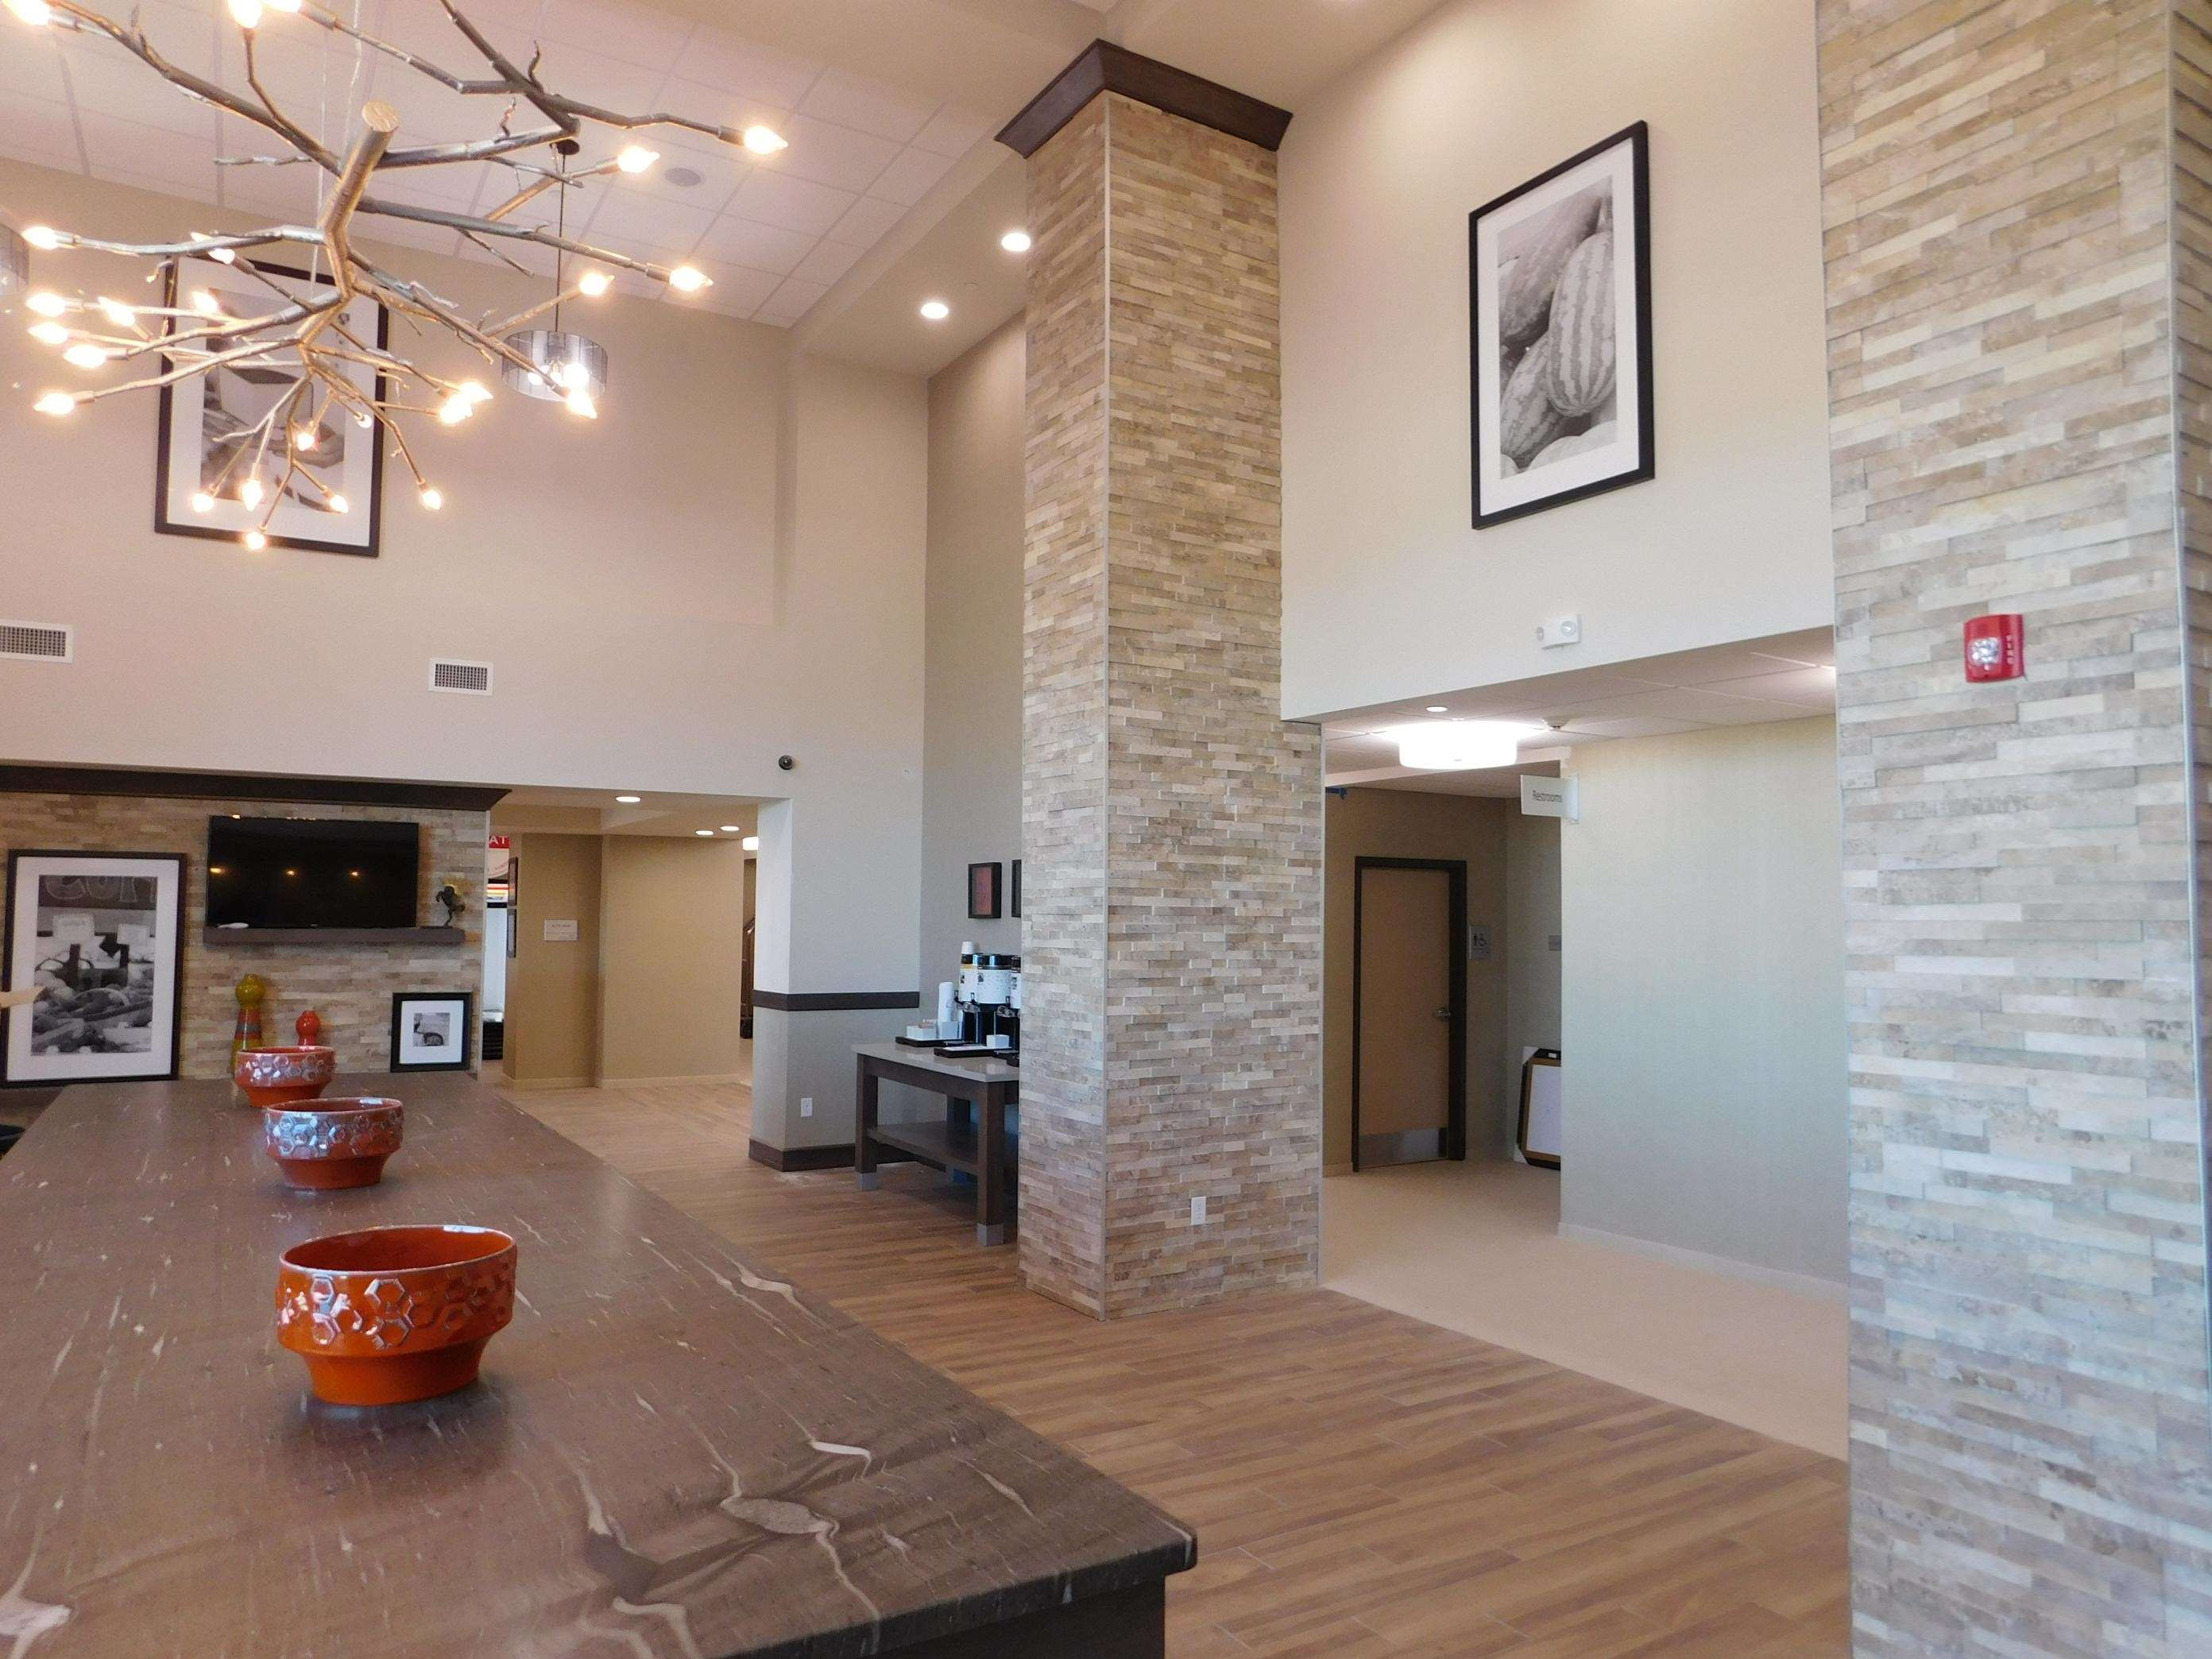 Hampton Inn & Suites Artesia image 0